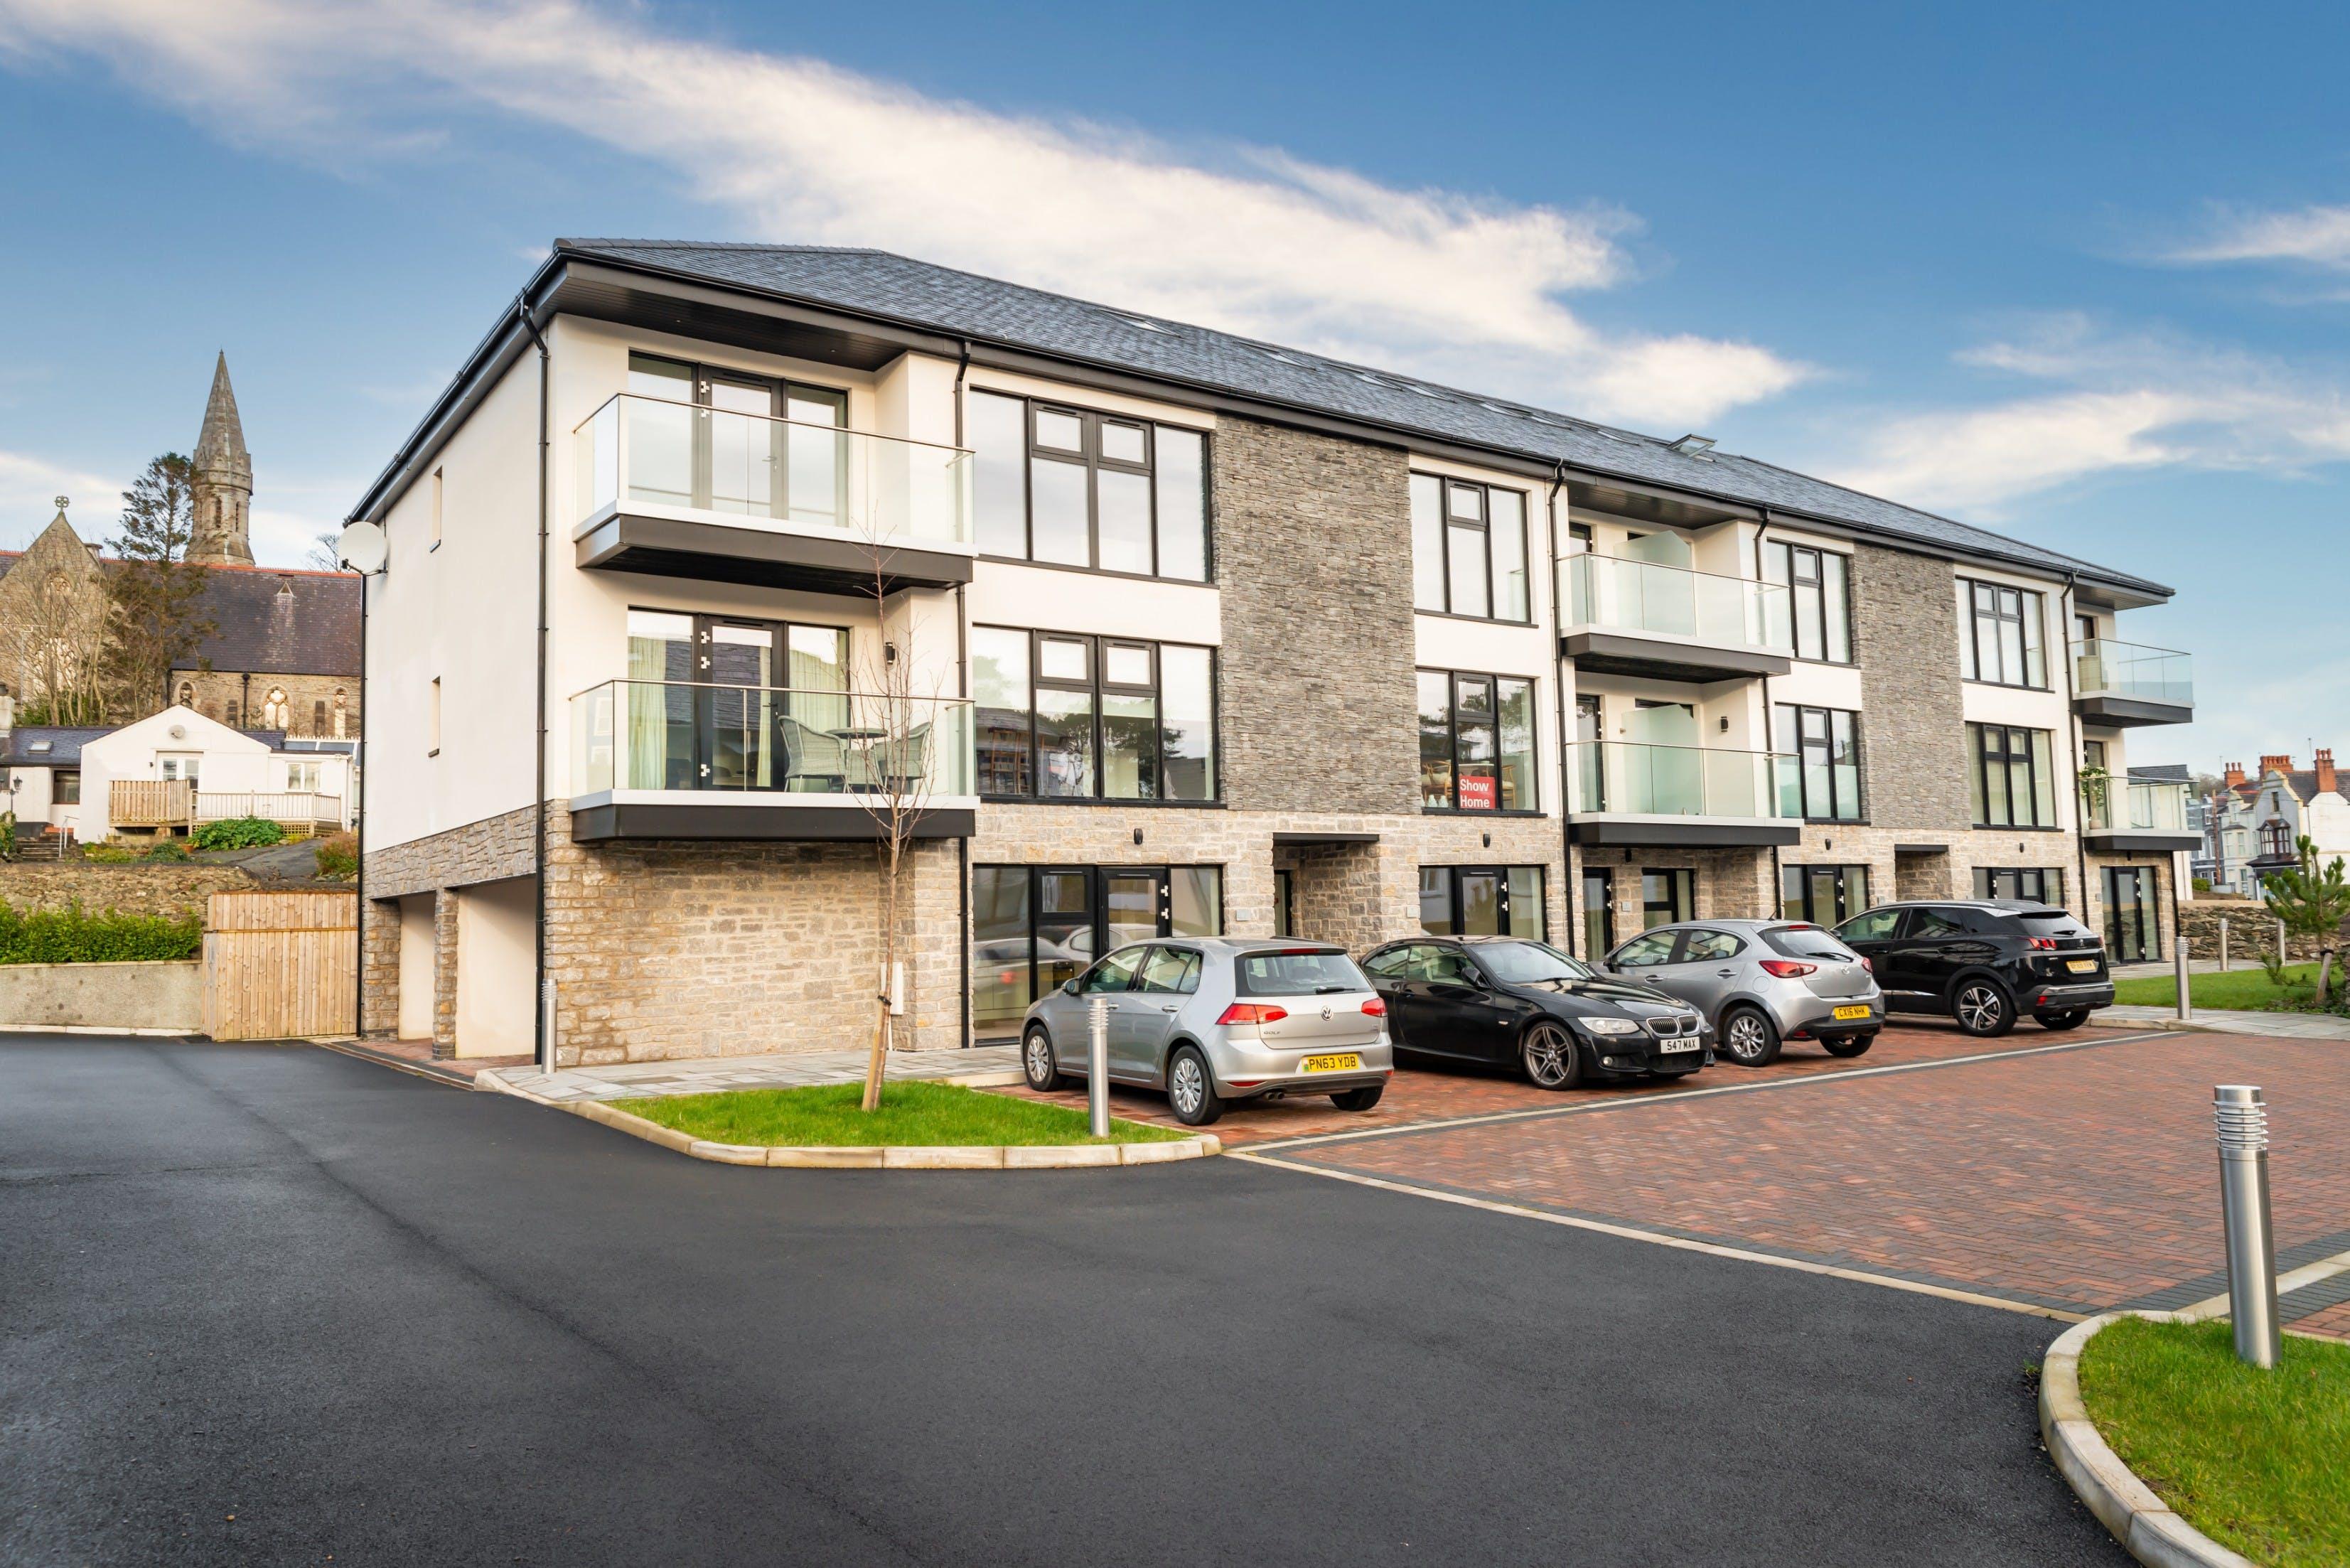 Min Y Don, Water Street, Menai Bridge, Anglesey, Residential For Sale - _SKY4267-Edit-1.jpg